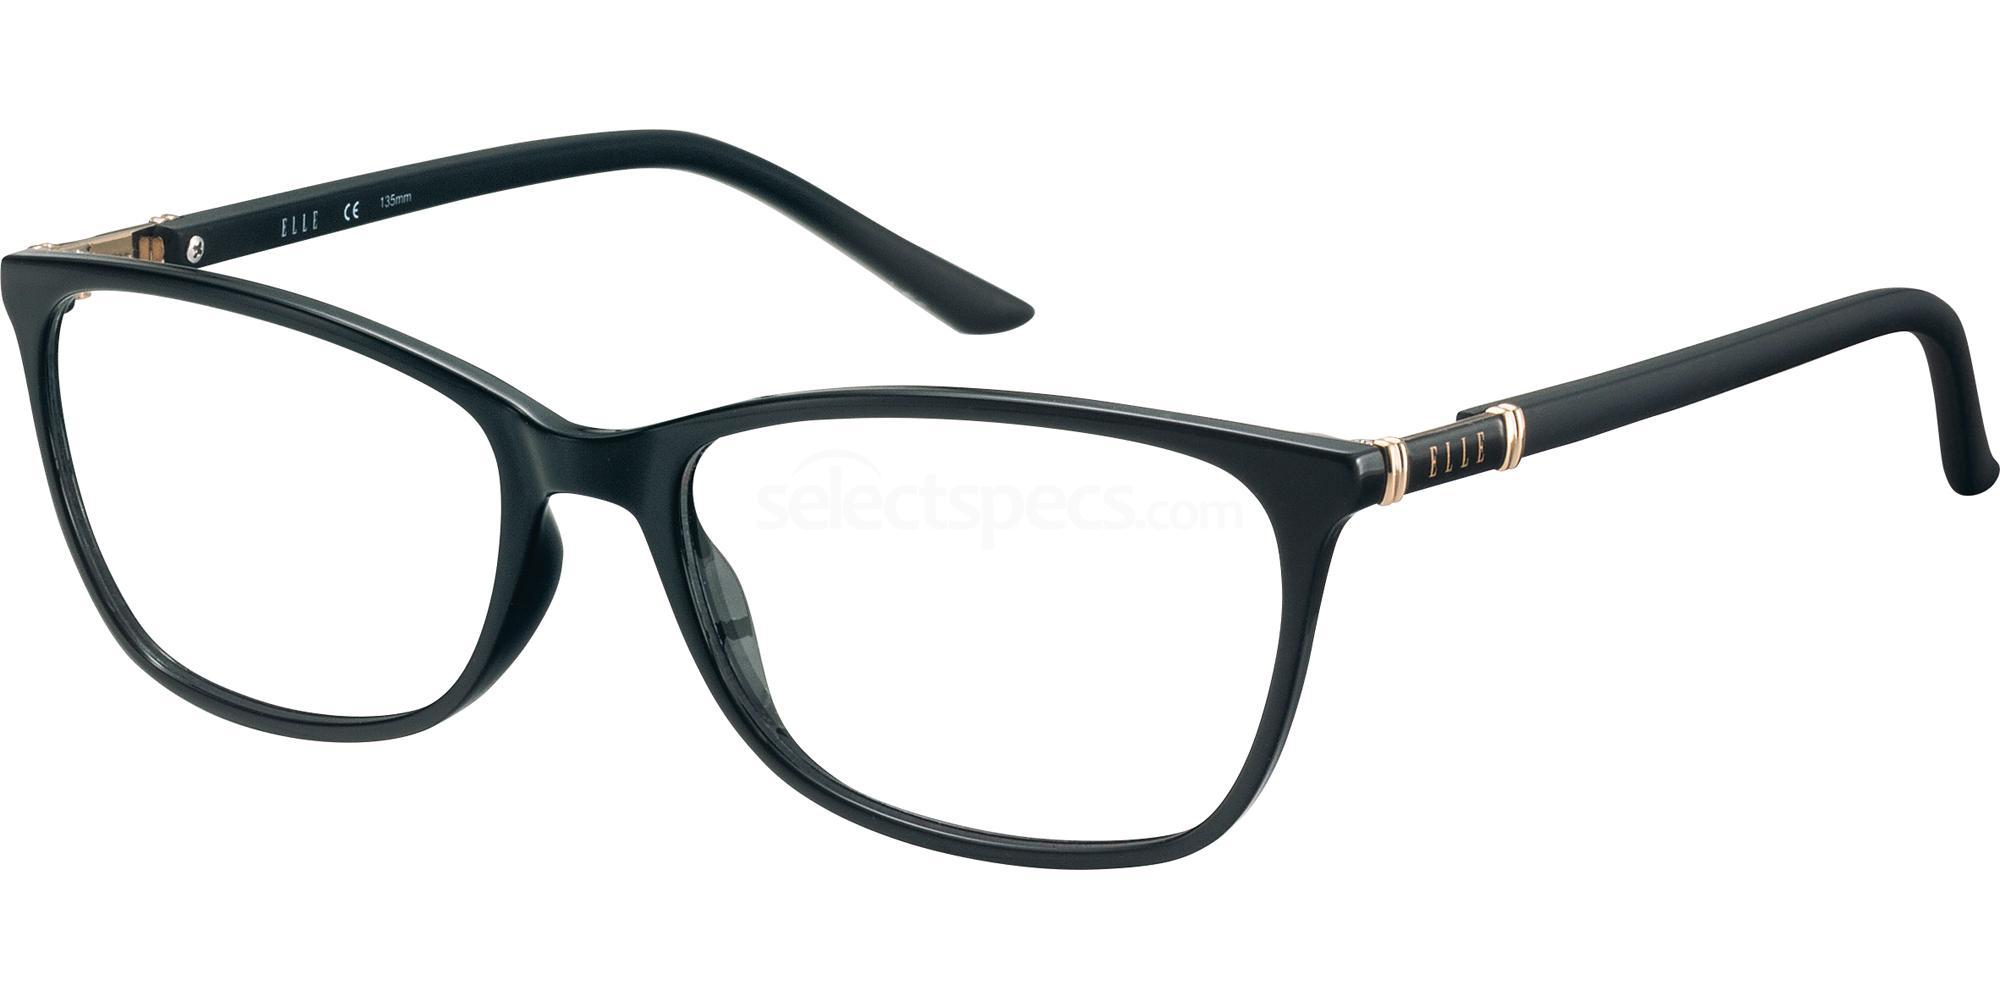 BK EL13409 Glasses, ELLE